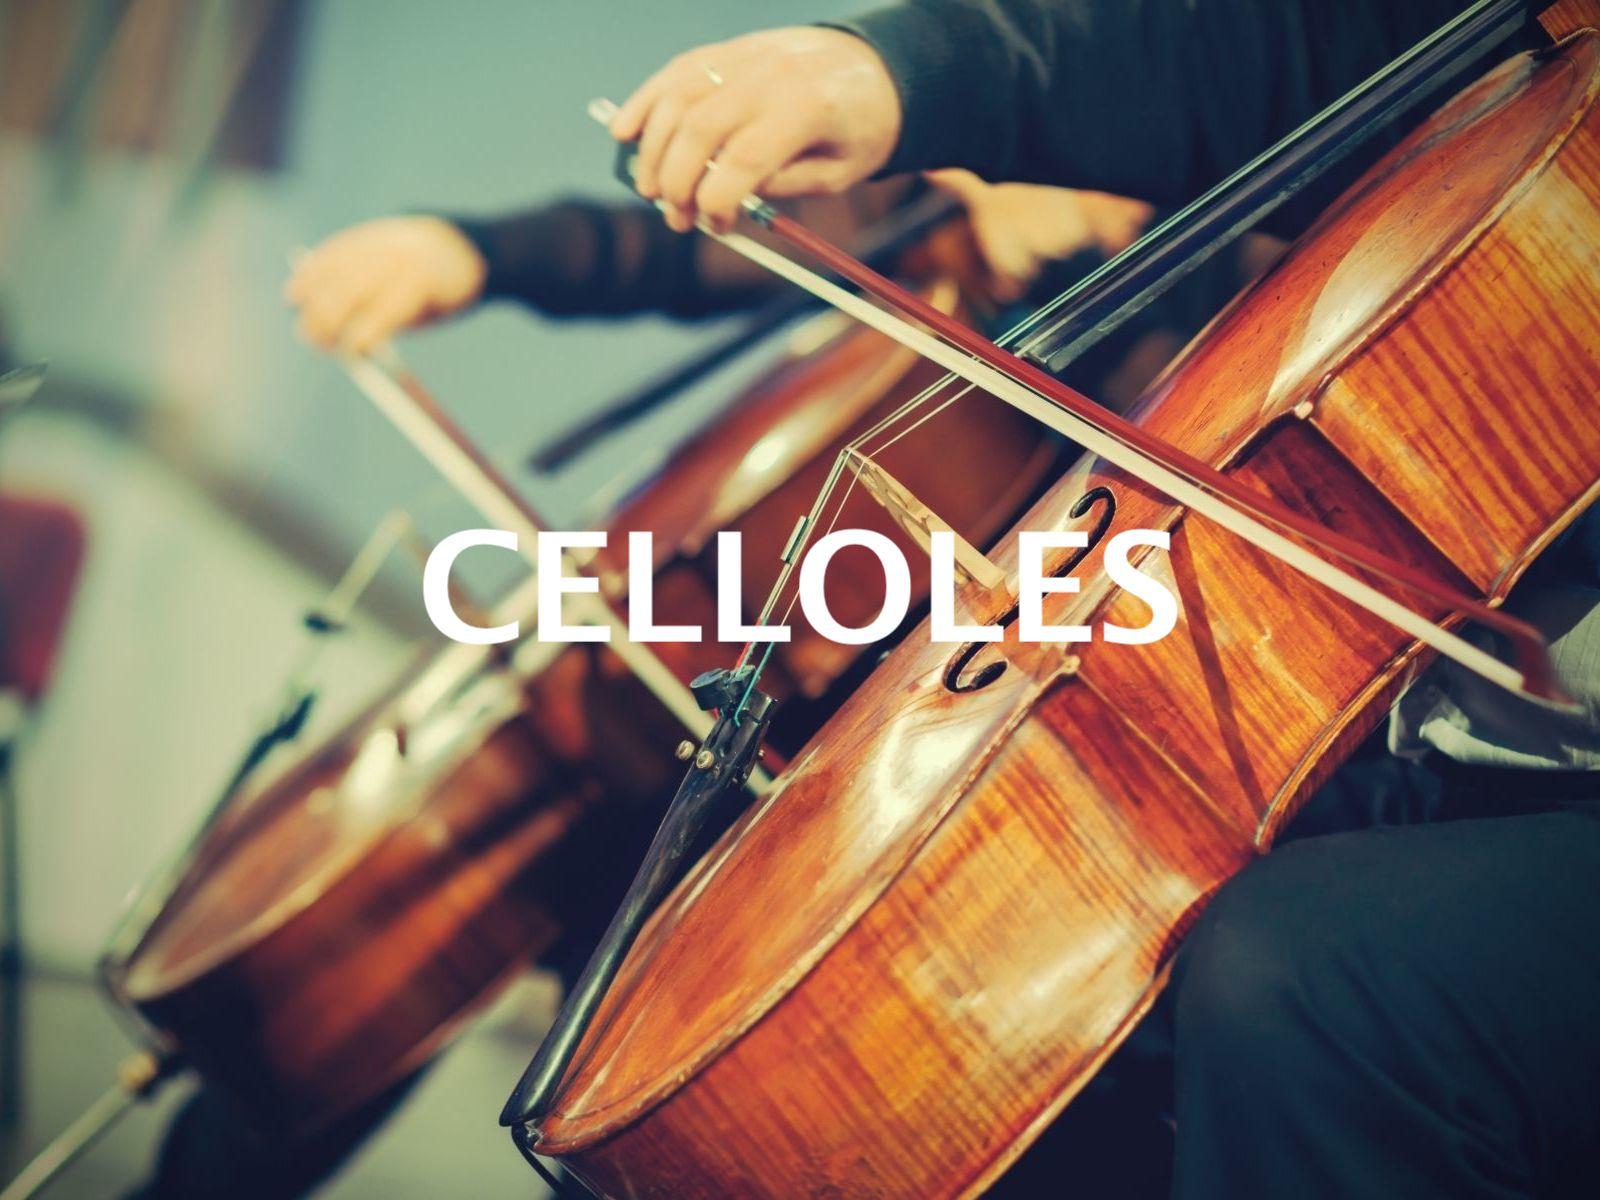 celloles